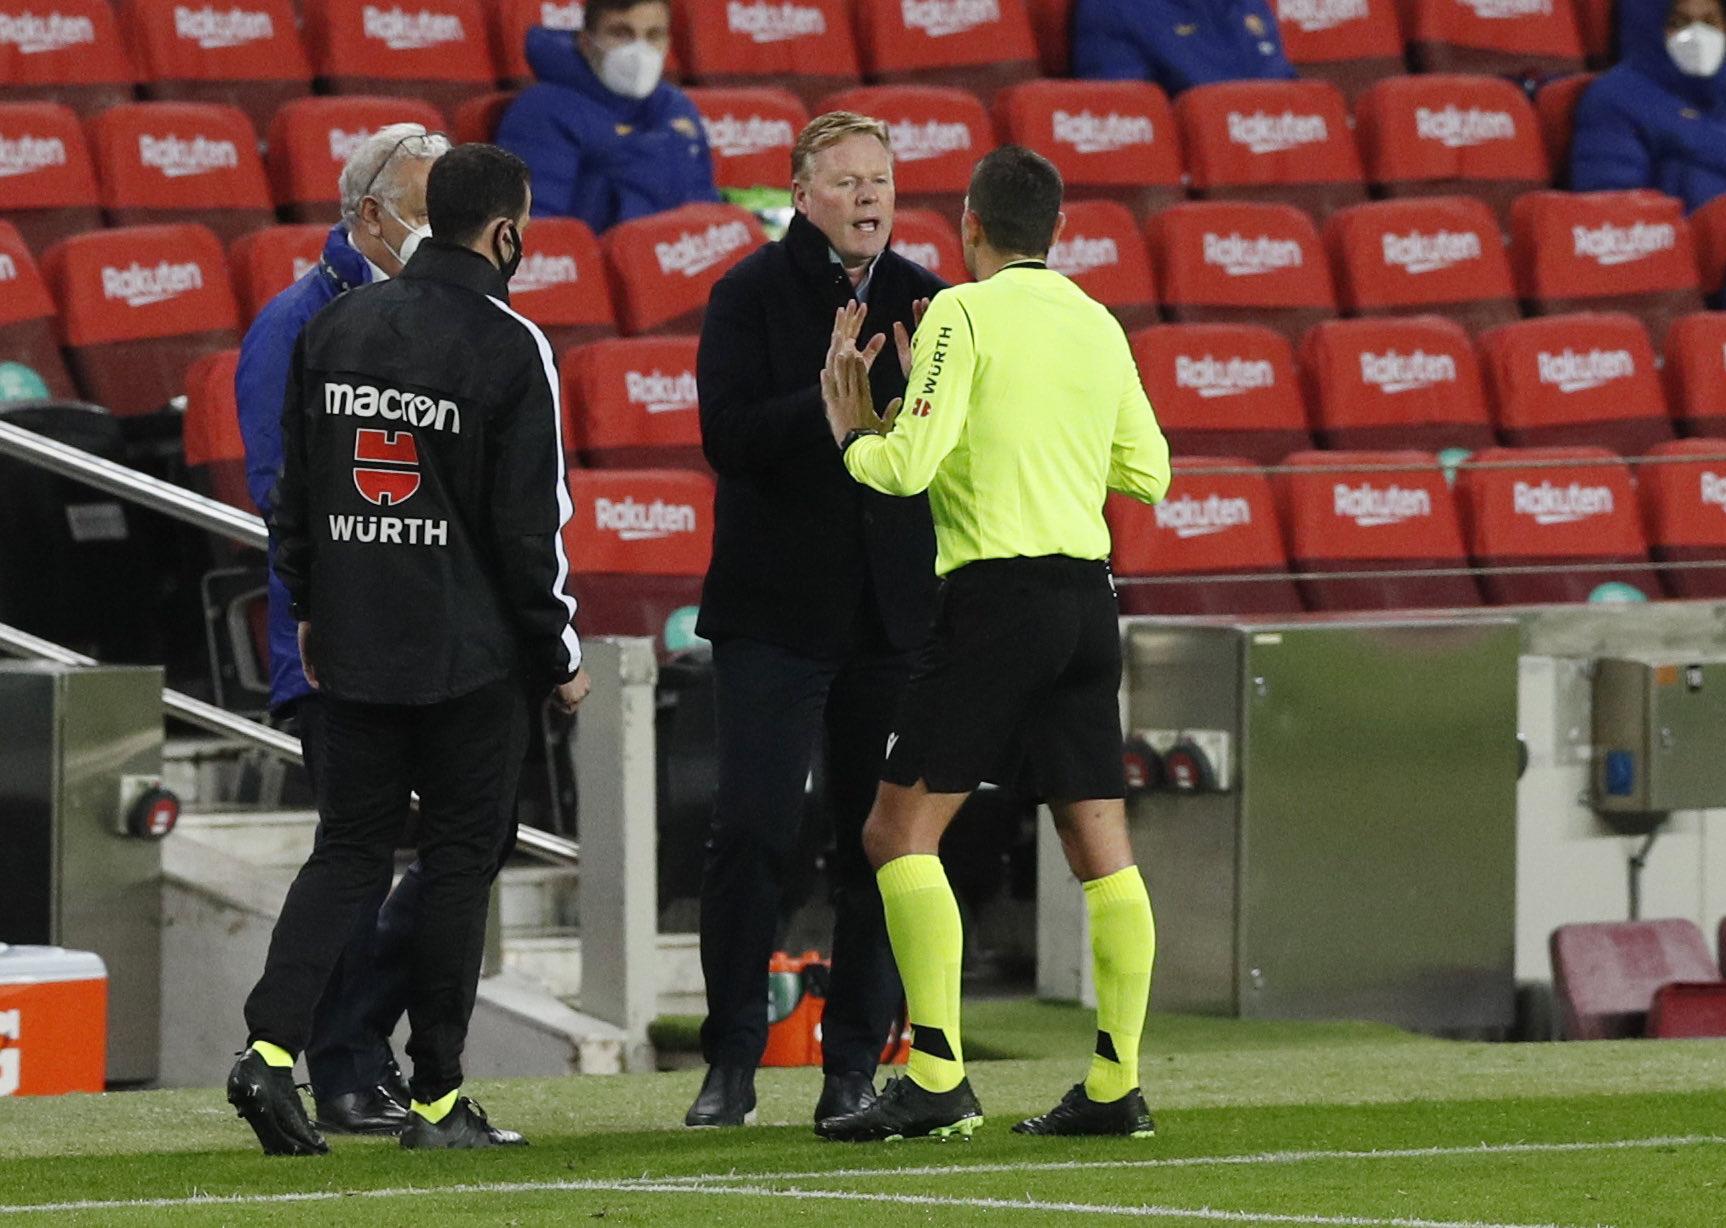 No le preocupa a Koeman su posible salida de Barcelona. Foto: Twitter Koeman